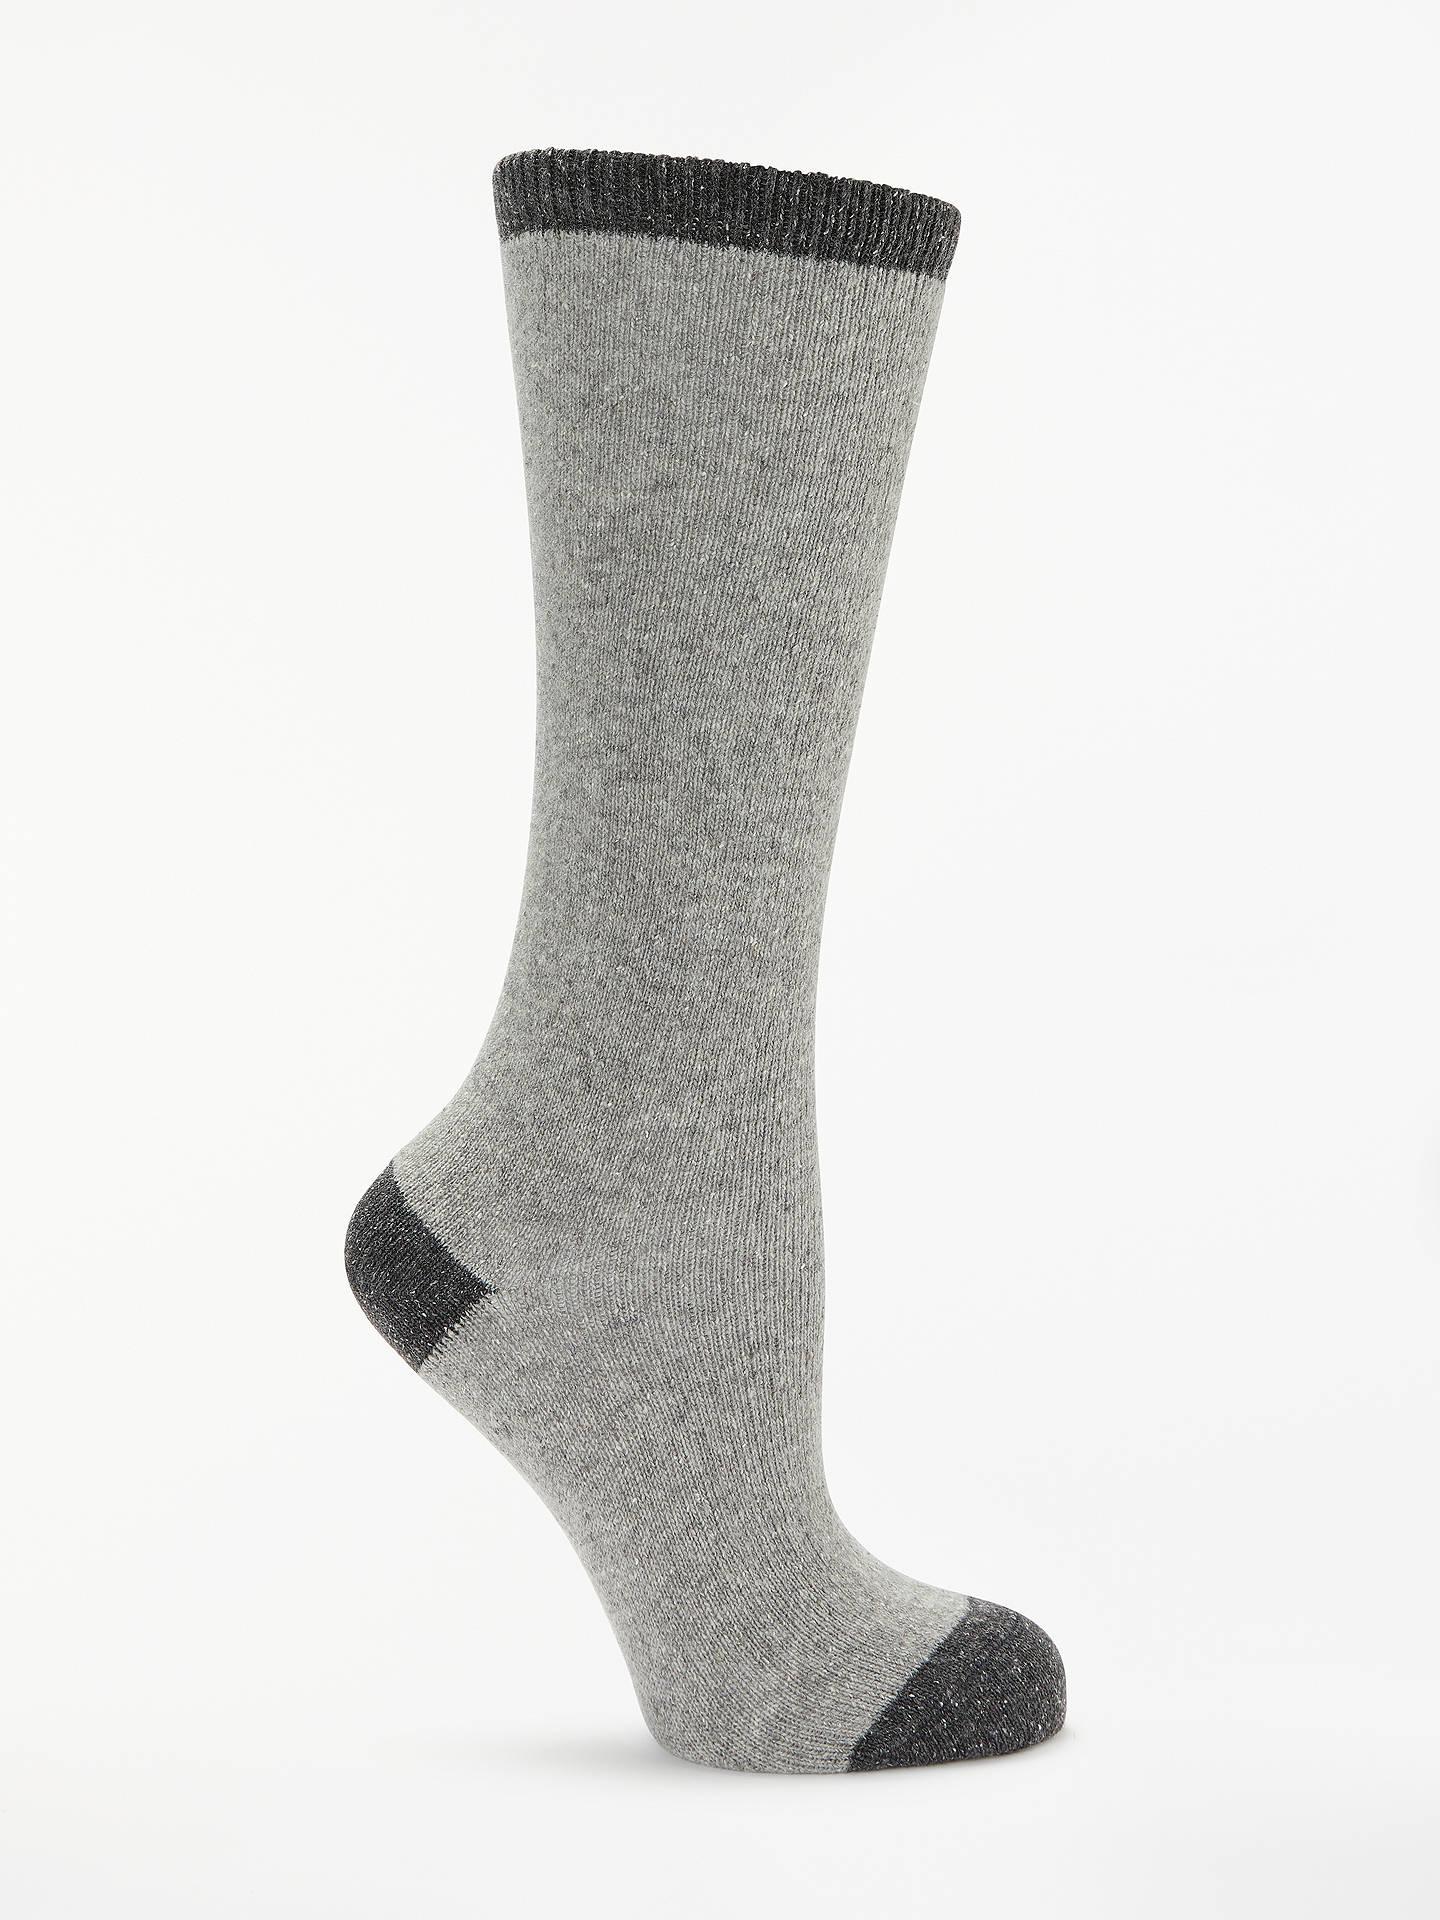 8a8207477d3 BuyJohn Lewis   Partners Wool and Silk Blend Knee High Socks